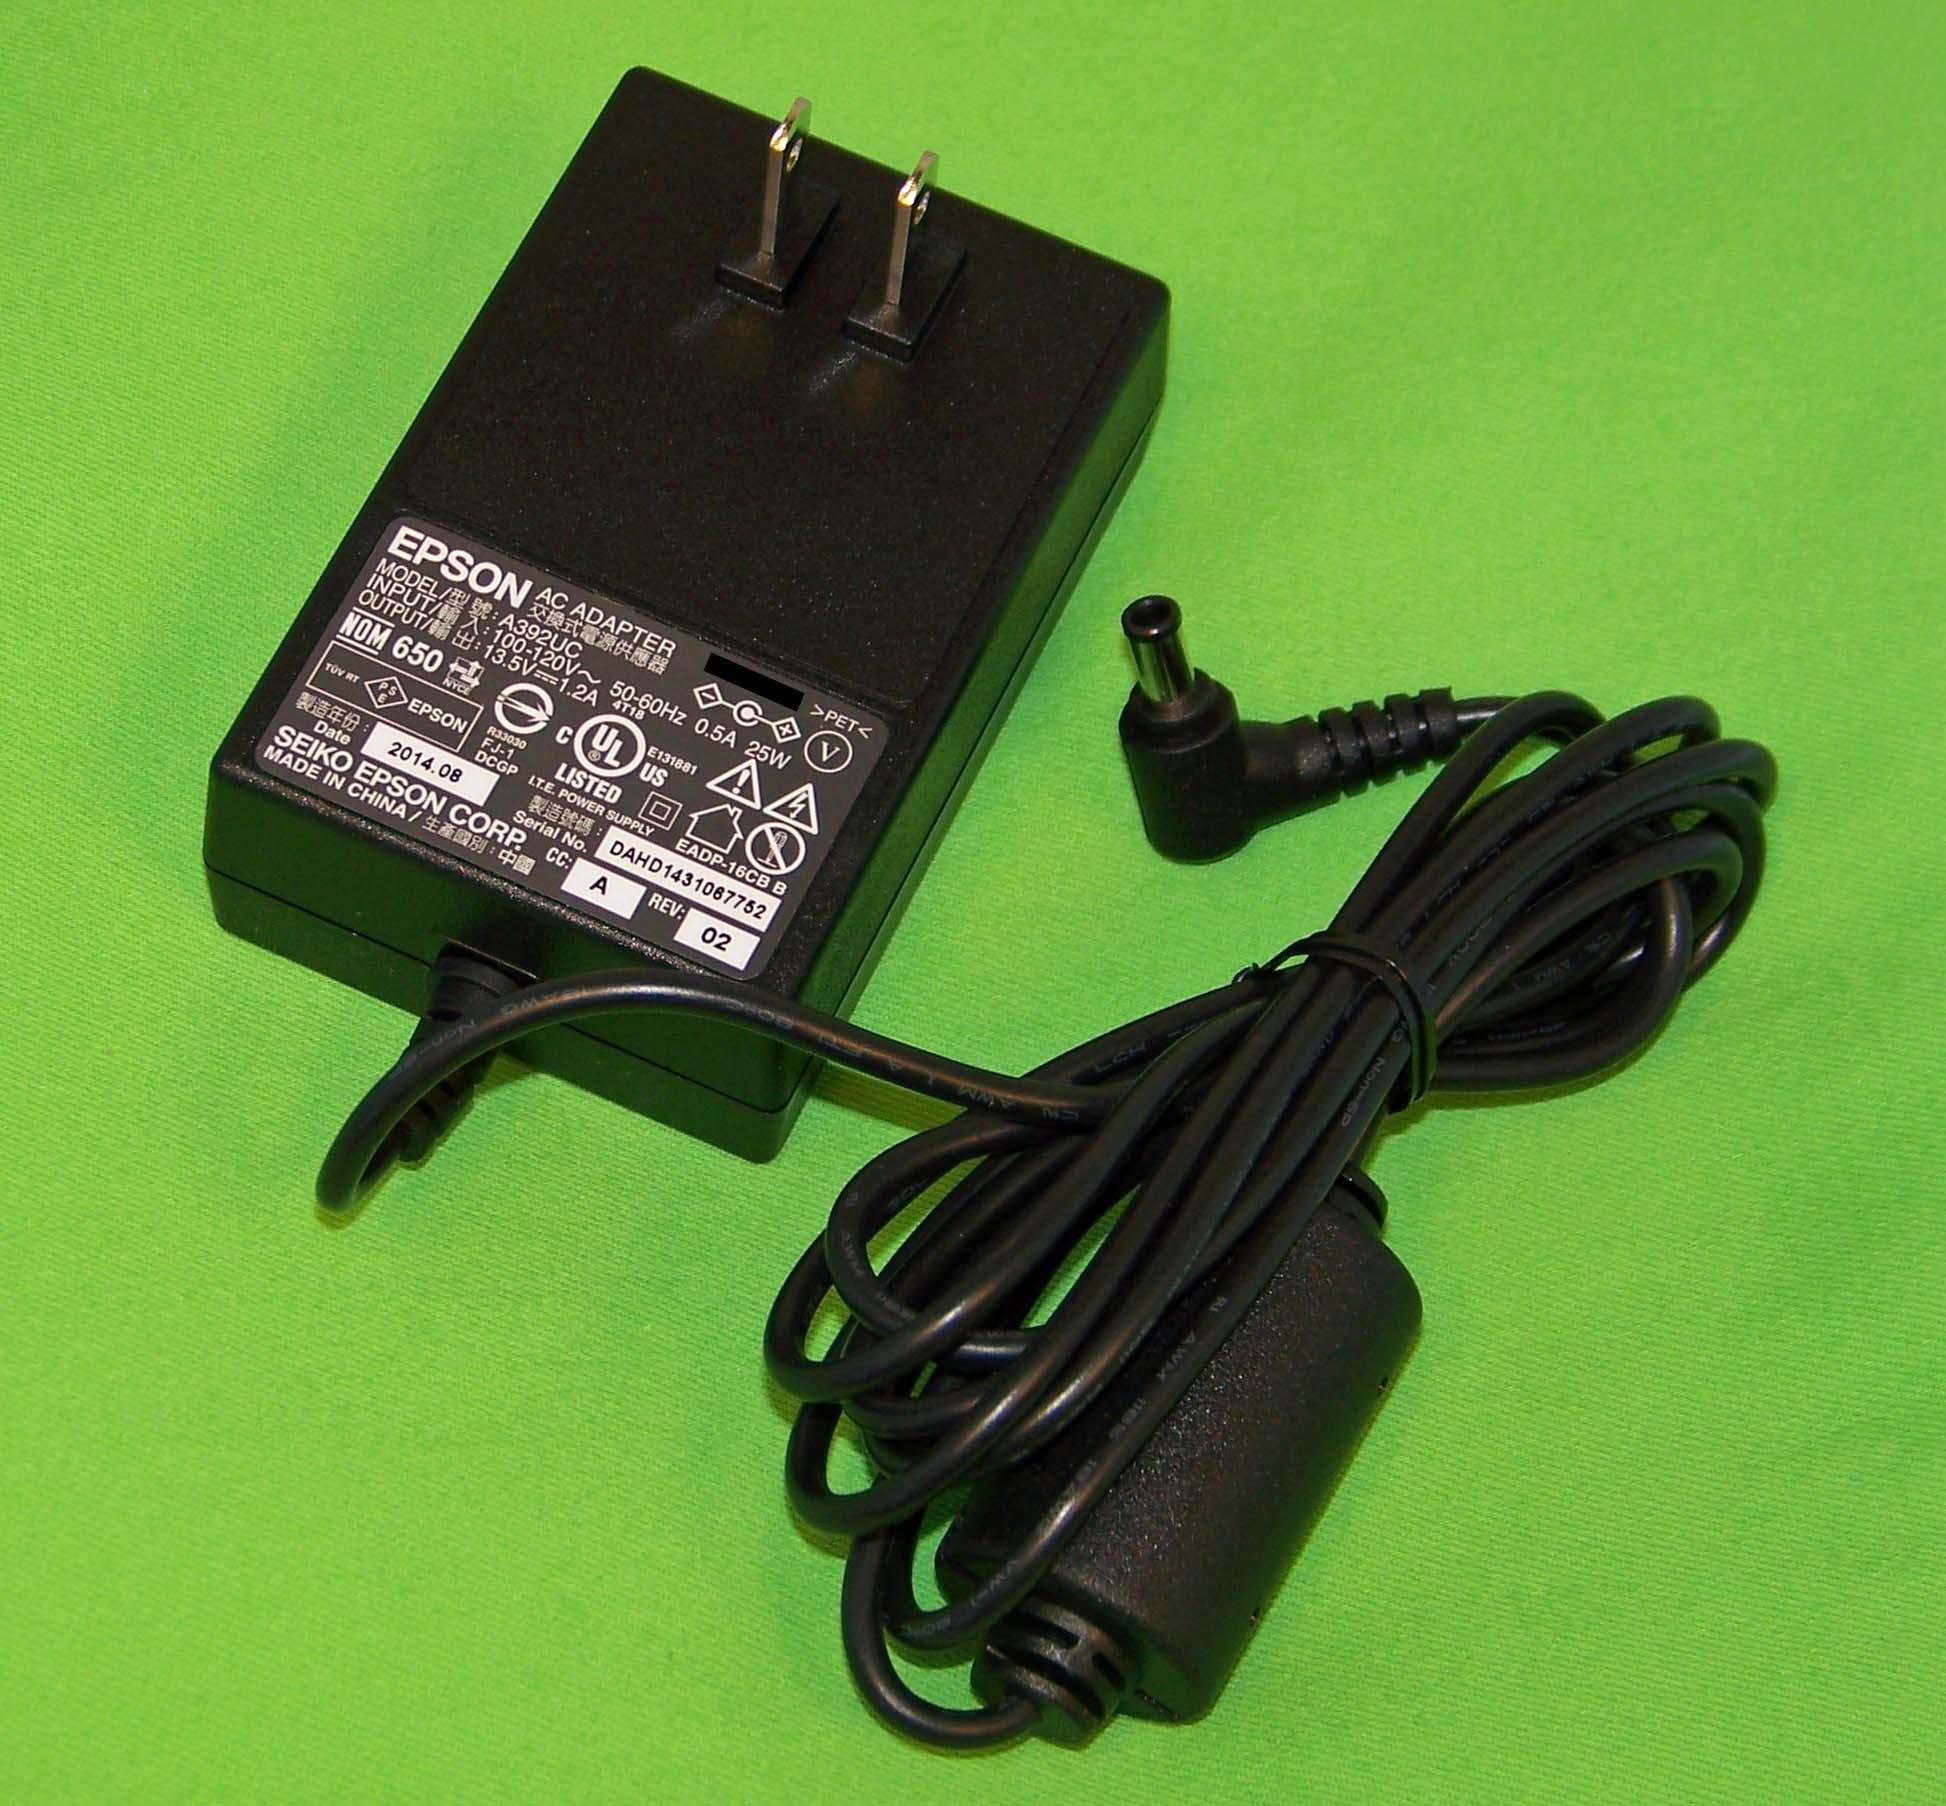 OEM Epson AC Adapter USA Only: Perfection V37, V370, V330...